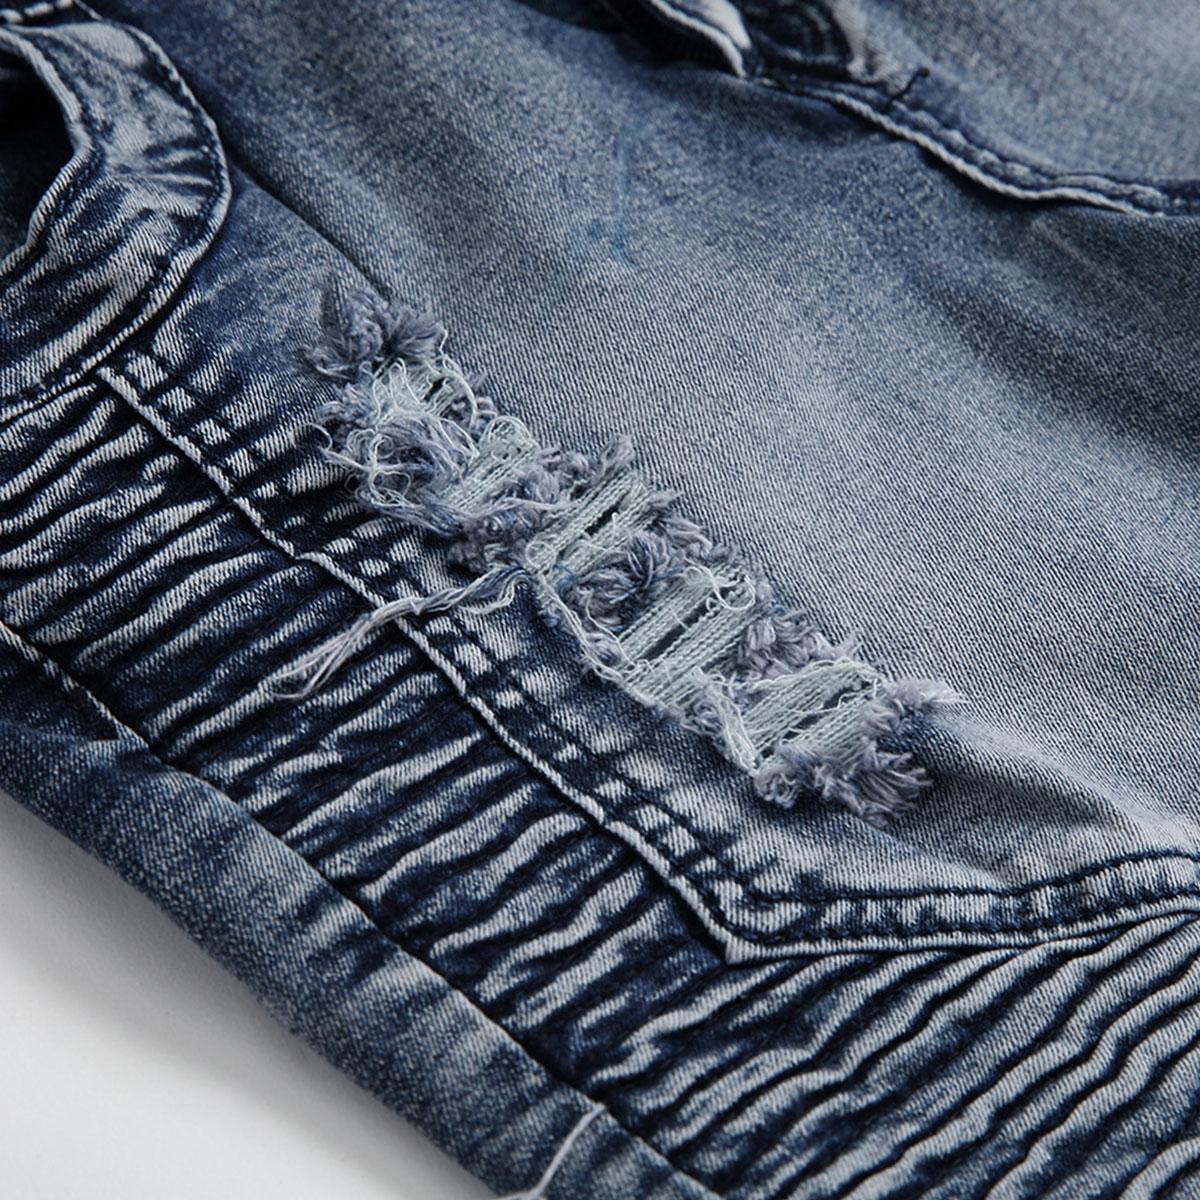 Men-039-s-Skinny-Biker-Jeans-Destroyed-Slim-Fit-Denim-Ripped-Pencil-Pants-Trousers thumbnail 23